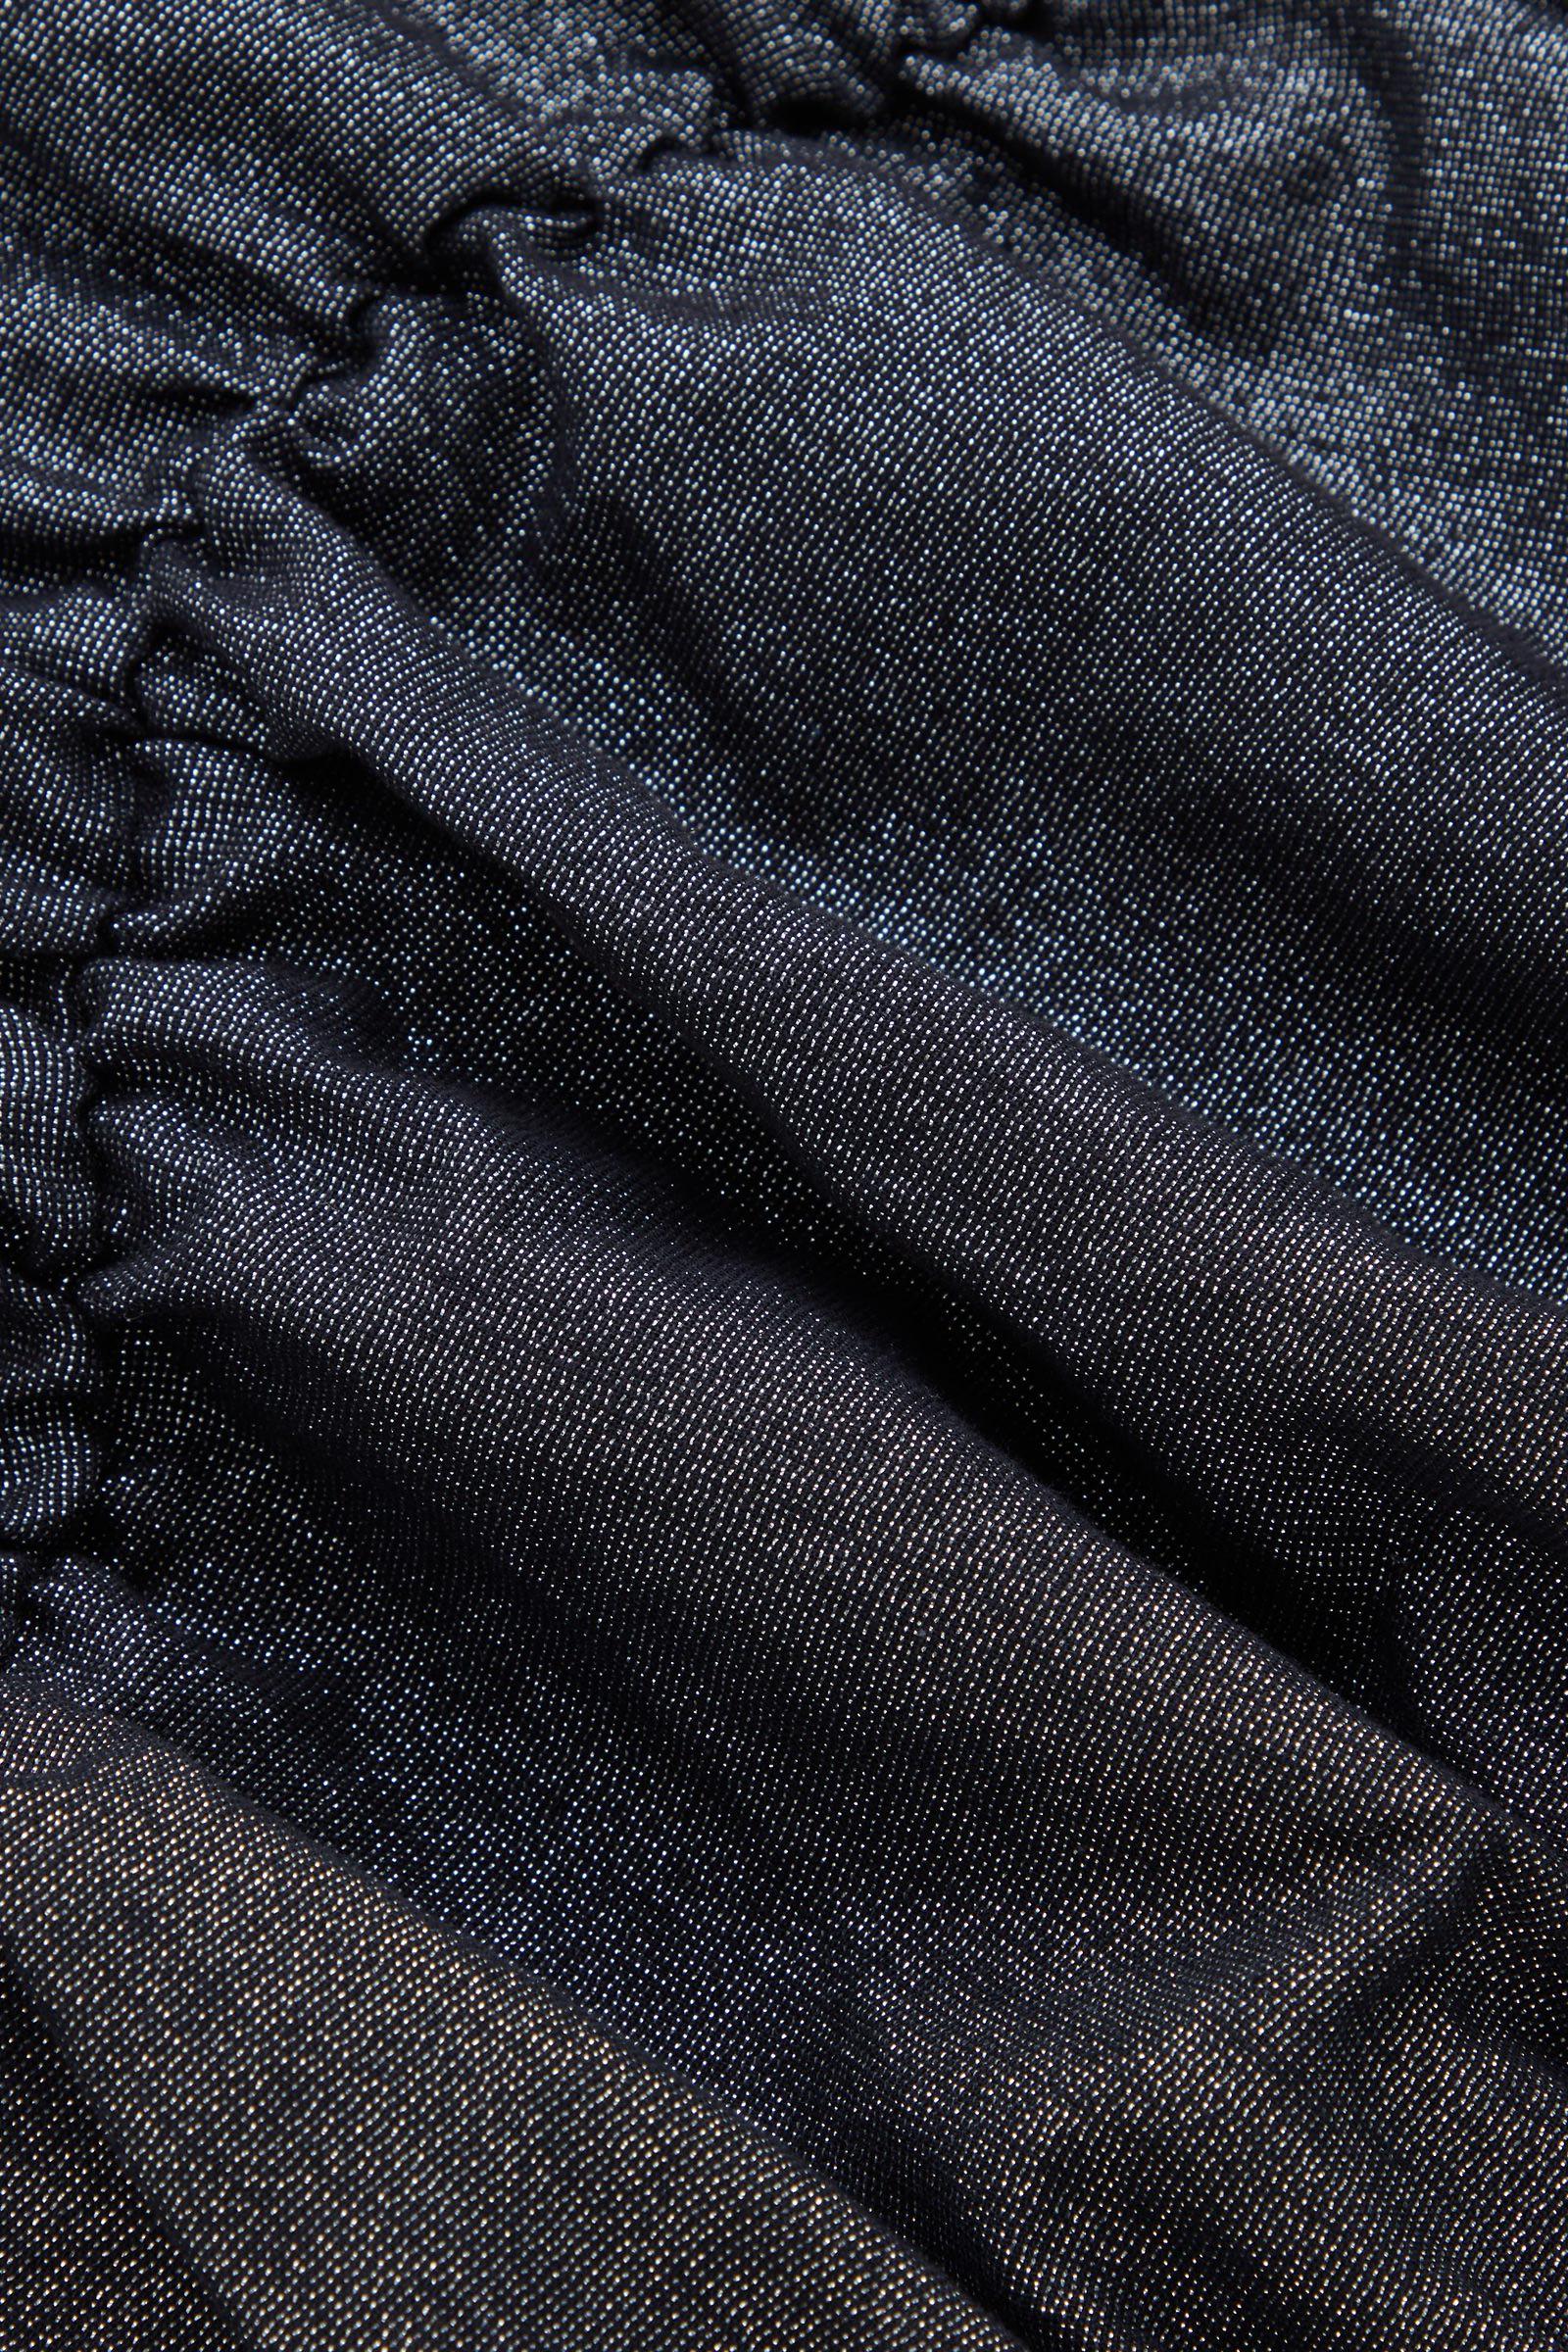 COS 개더드 루렉스 드레스의 블랙컬러 Detail입니다.